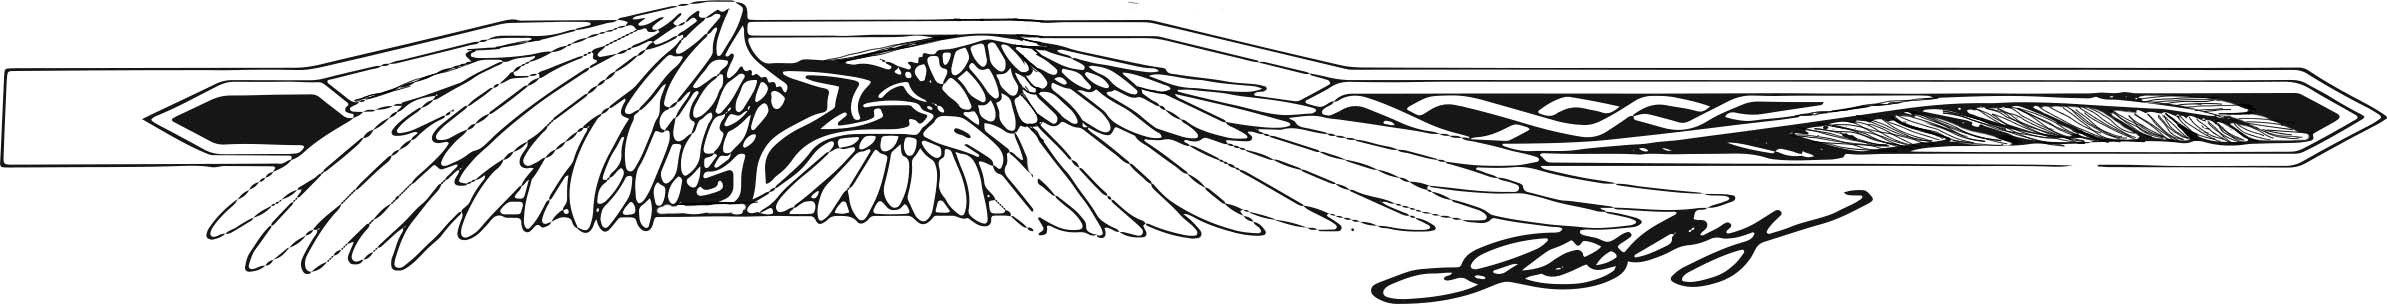 Nordic Raven.jpg